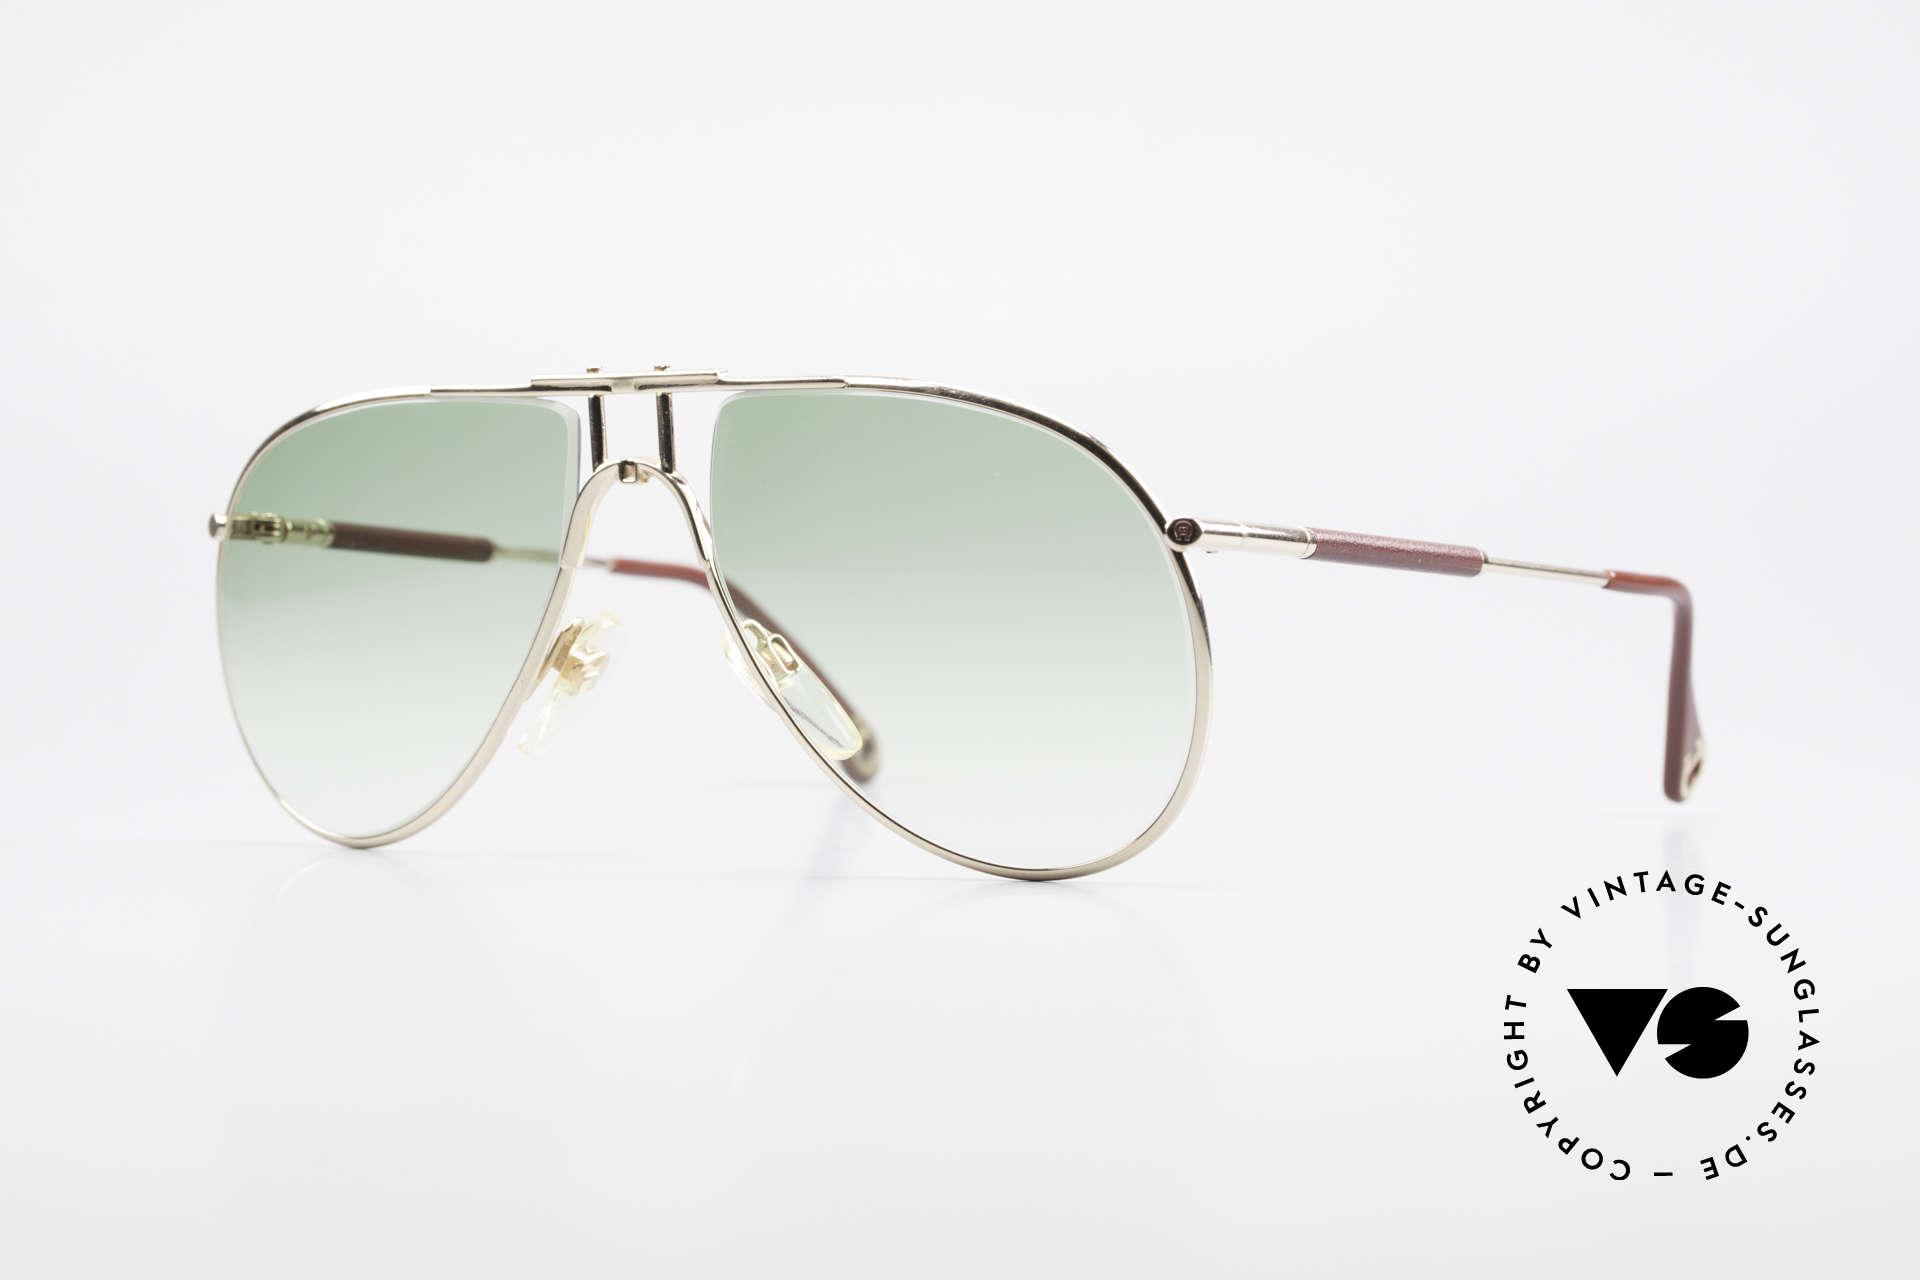 Aigner EA3 Echt 80er Vintage Sonnenbrille, Etienne Aigner 80er VINTAGE Designer-Sonnenbrille, Passend für Herren